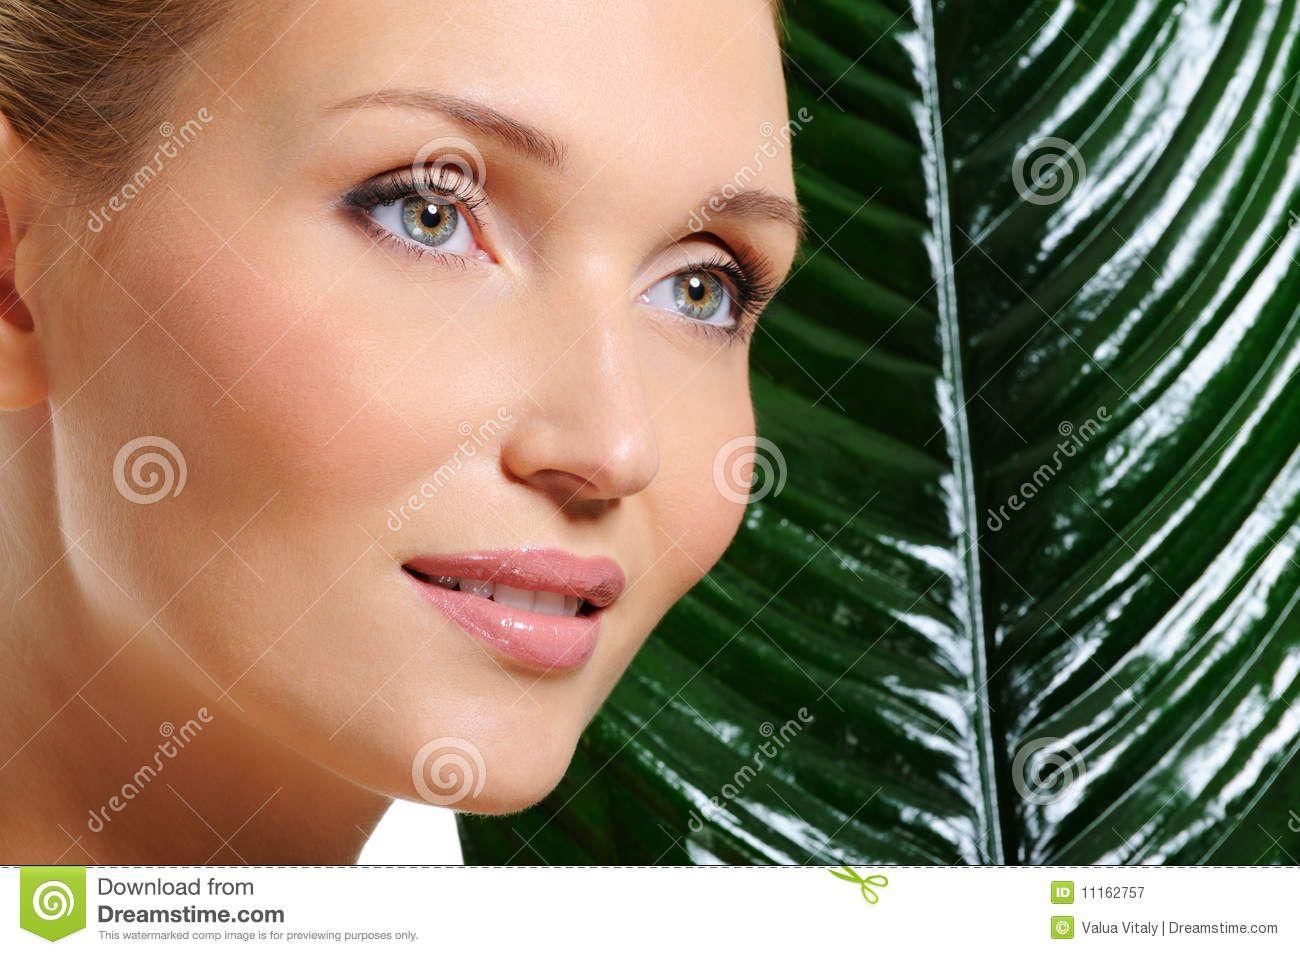 Woman with Healthy Skin healthy skin Moisturizing face cream